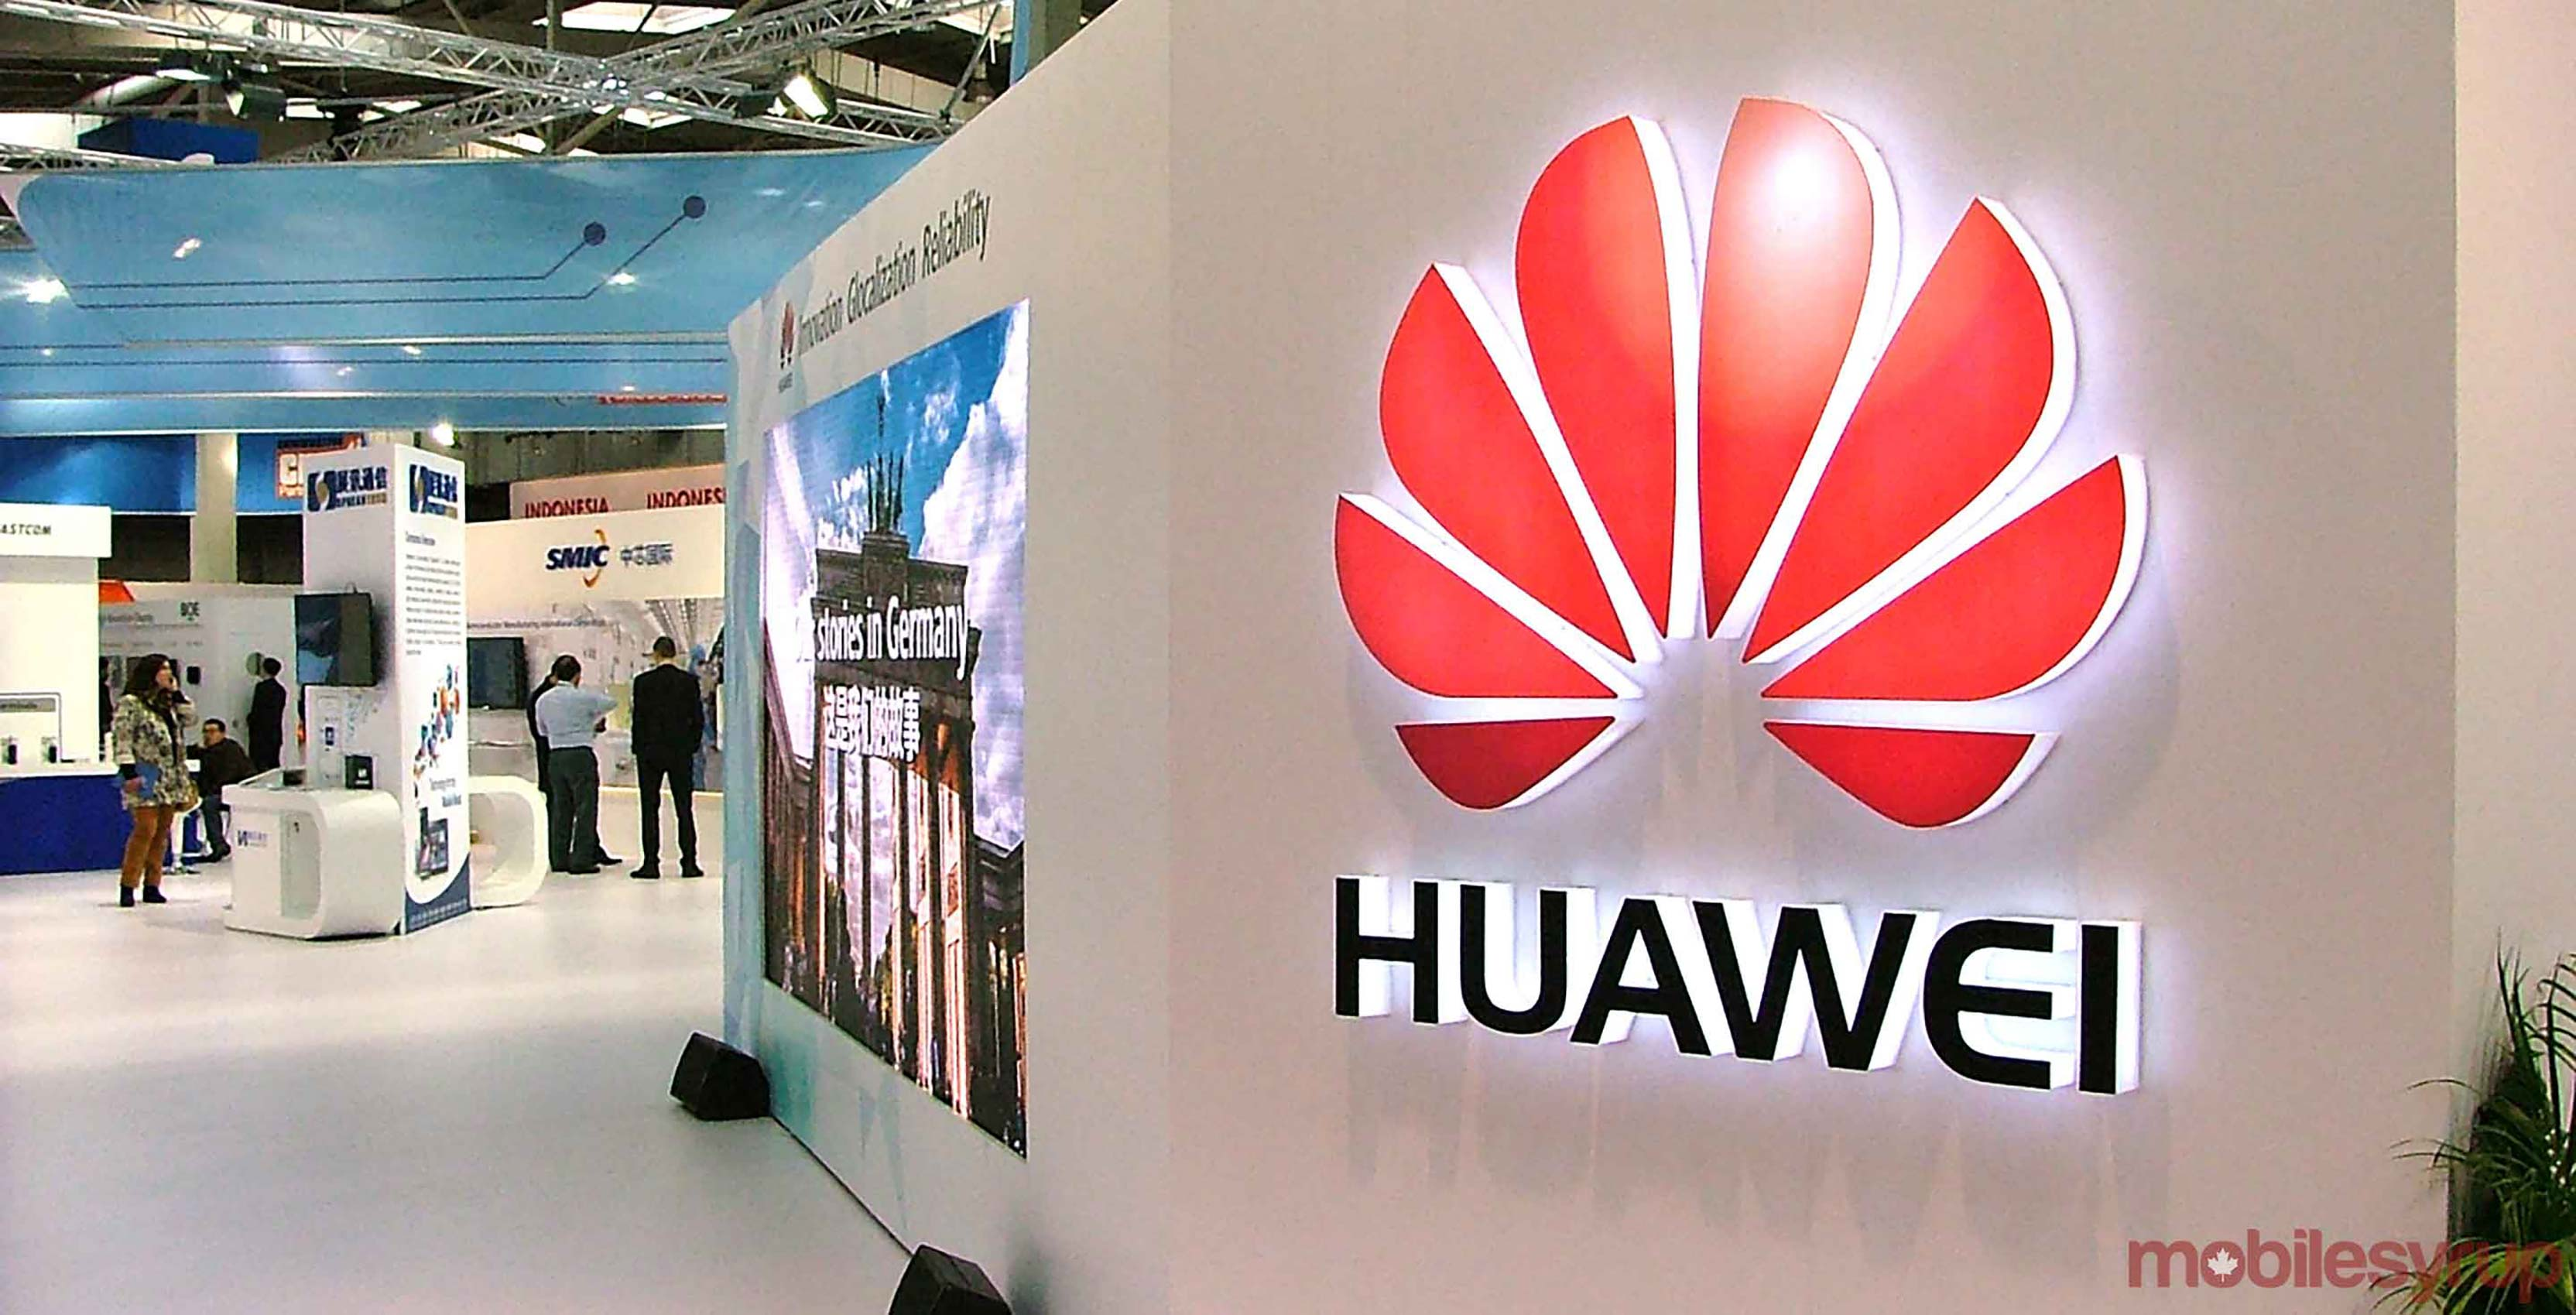 Huawei logo on wall